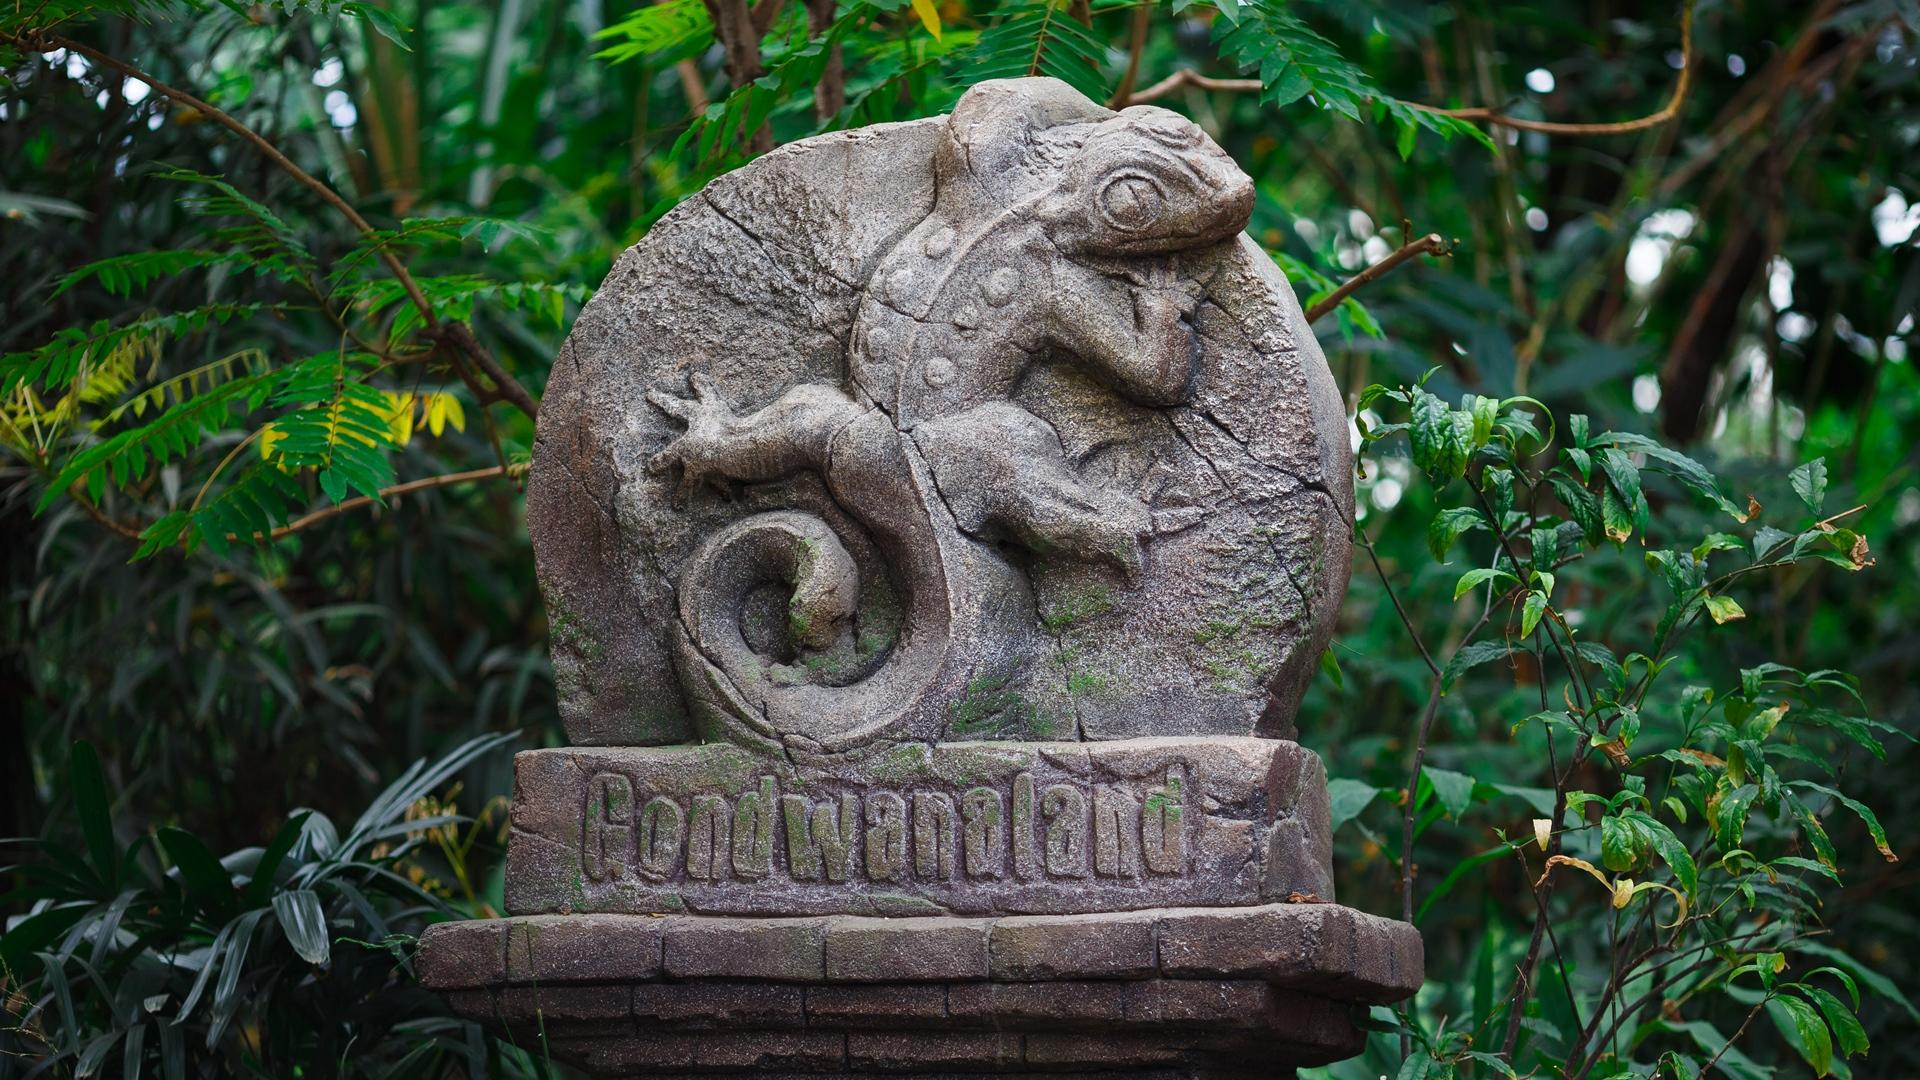 Pointer of Gondwanaland